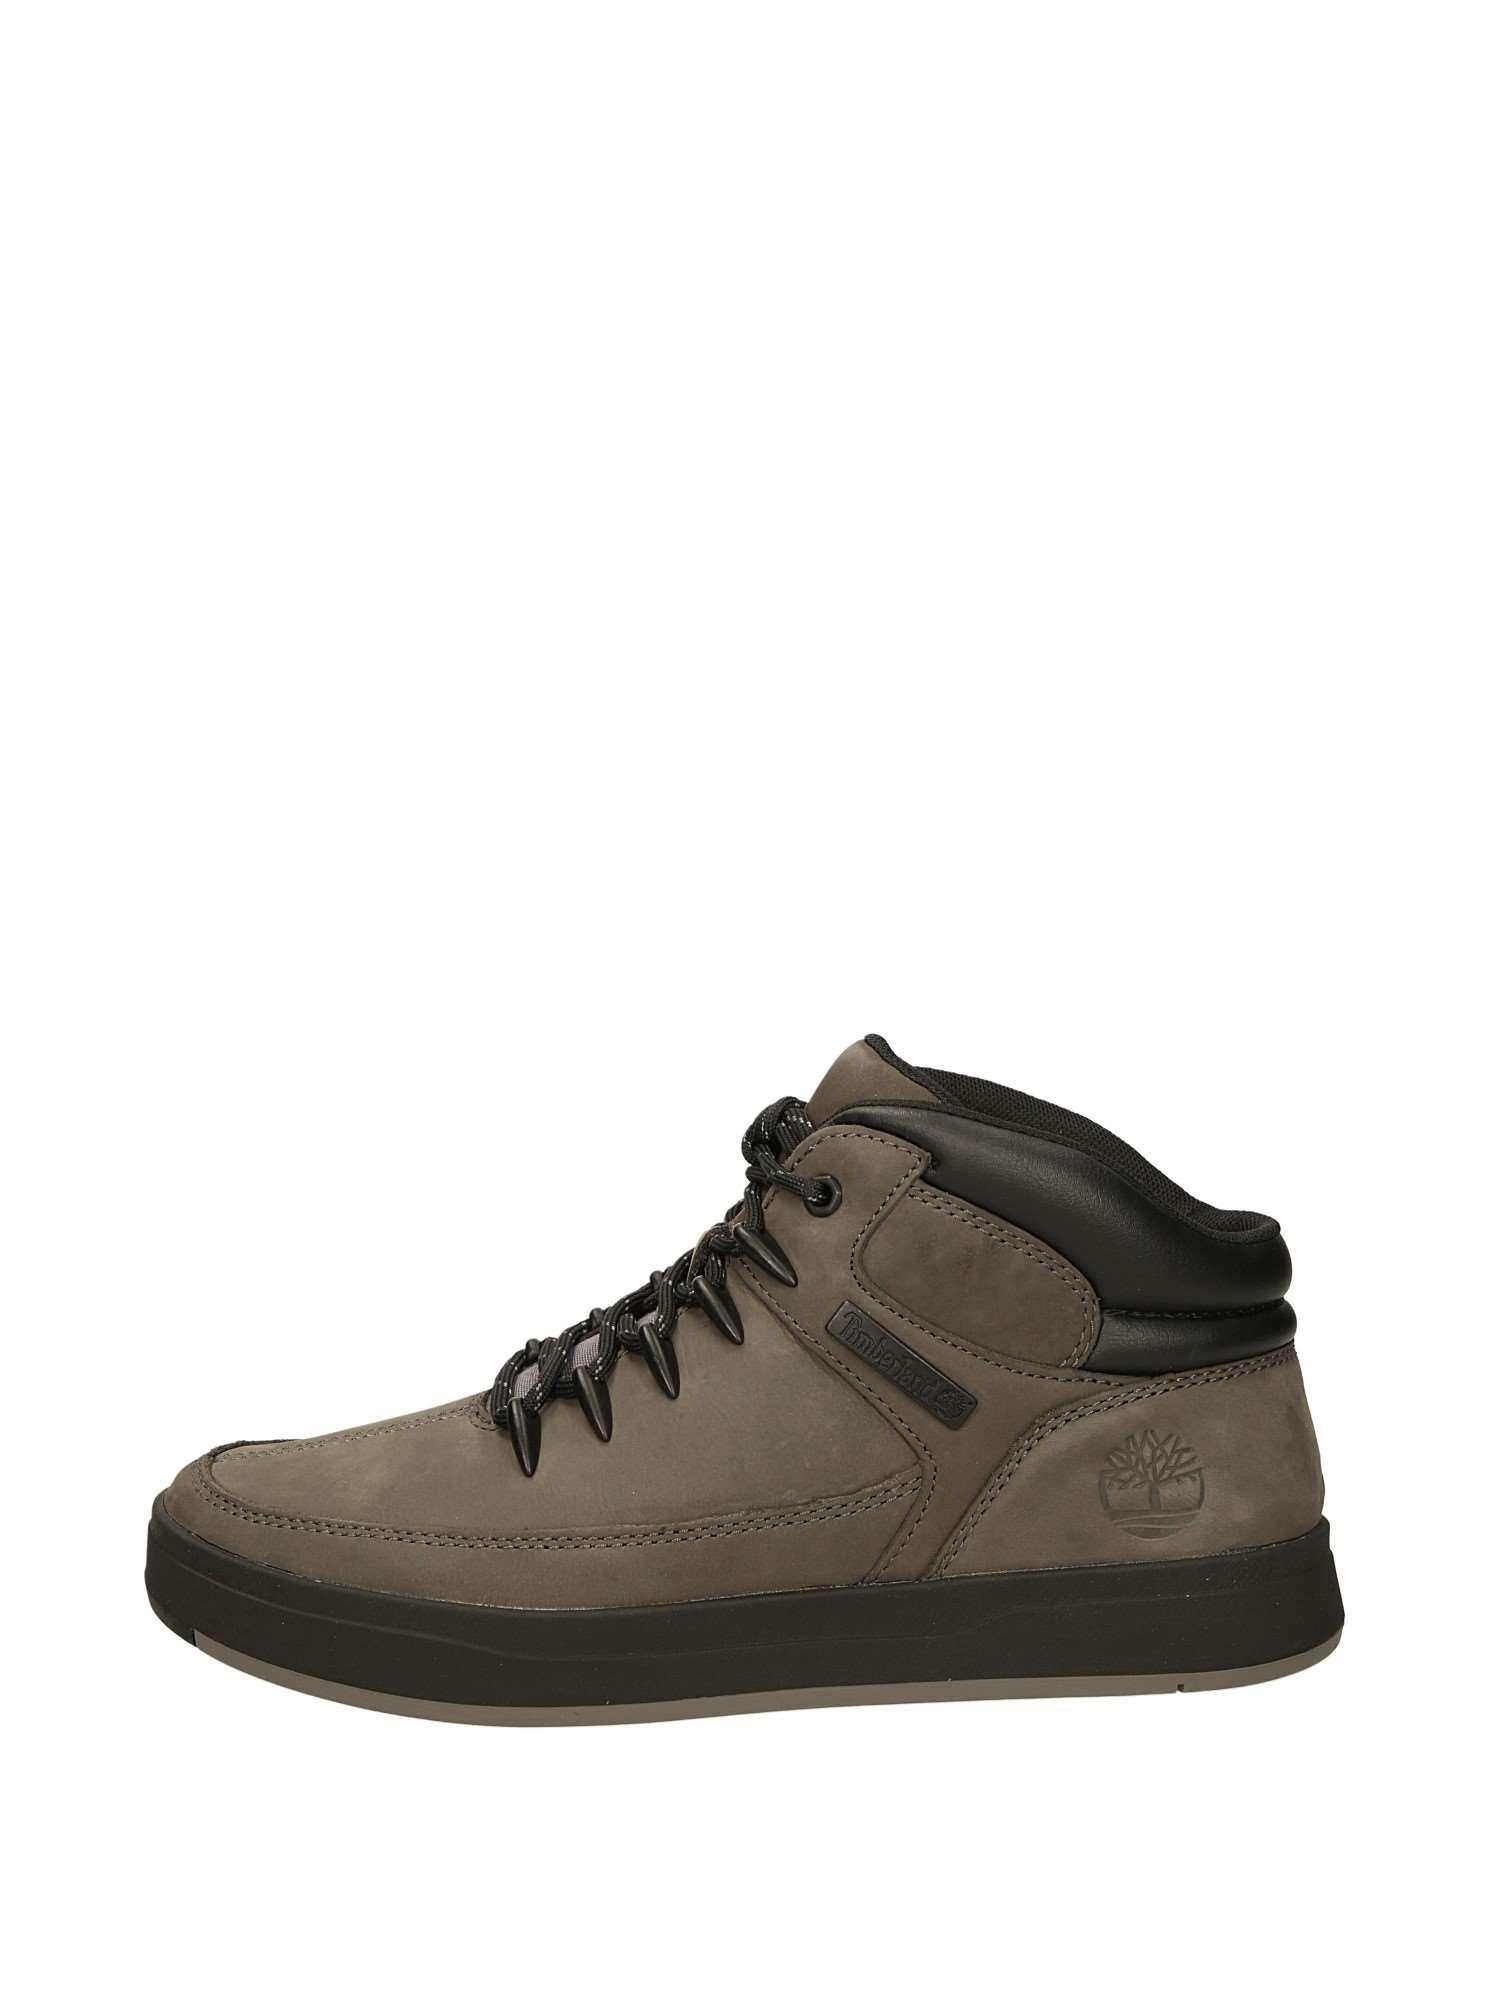 Timberland Sneakers Alte Uomo GrigioLalilina Timberland HE29IDWY